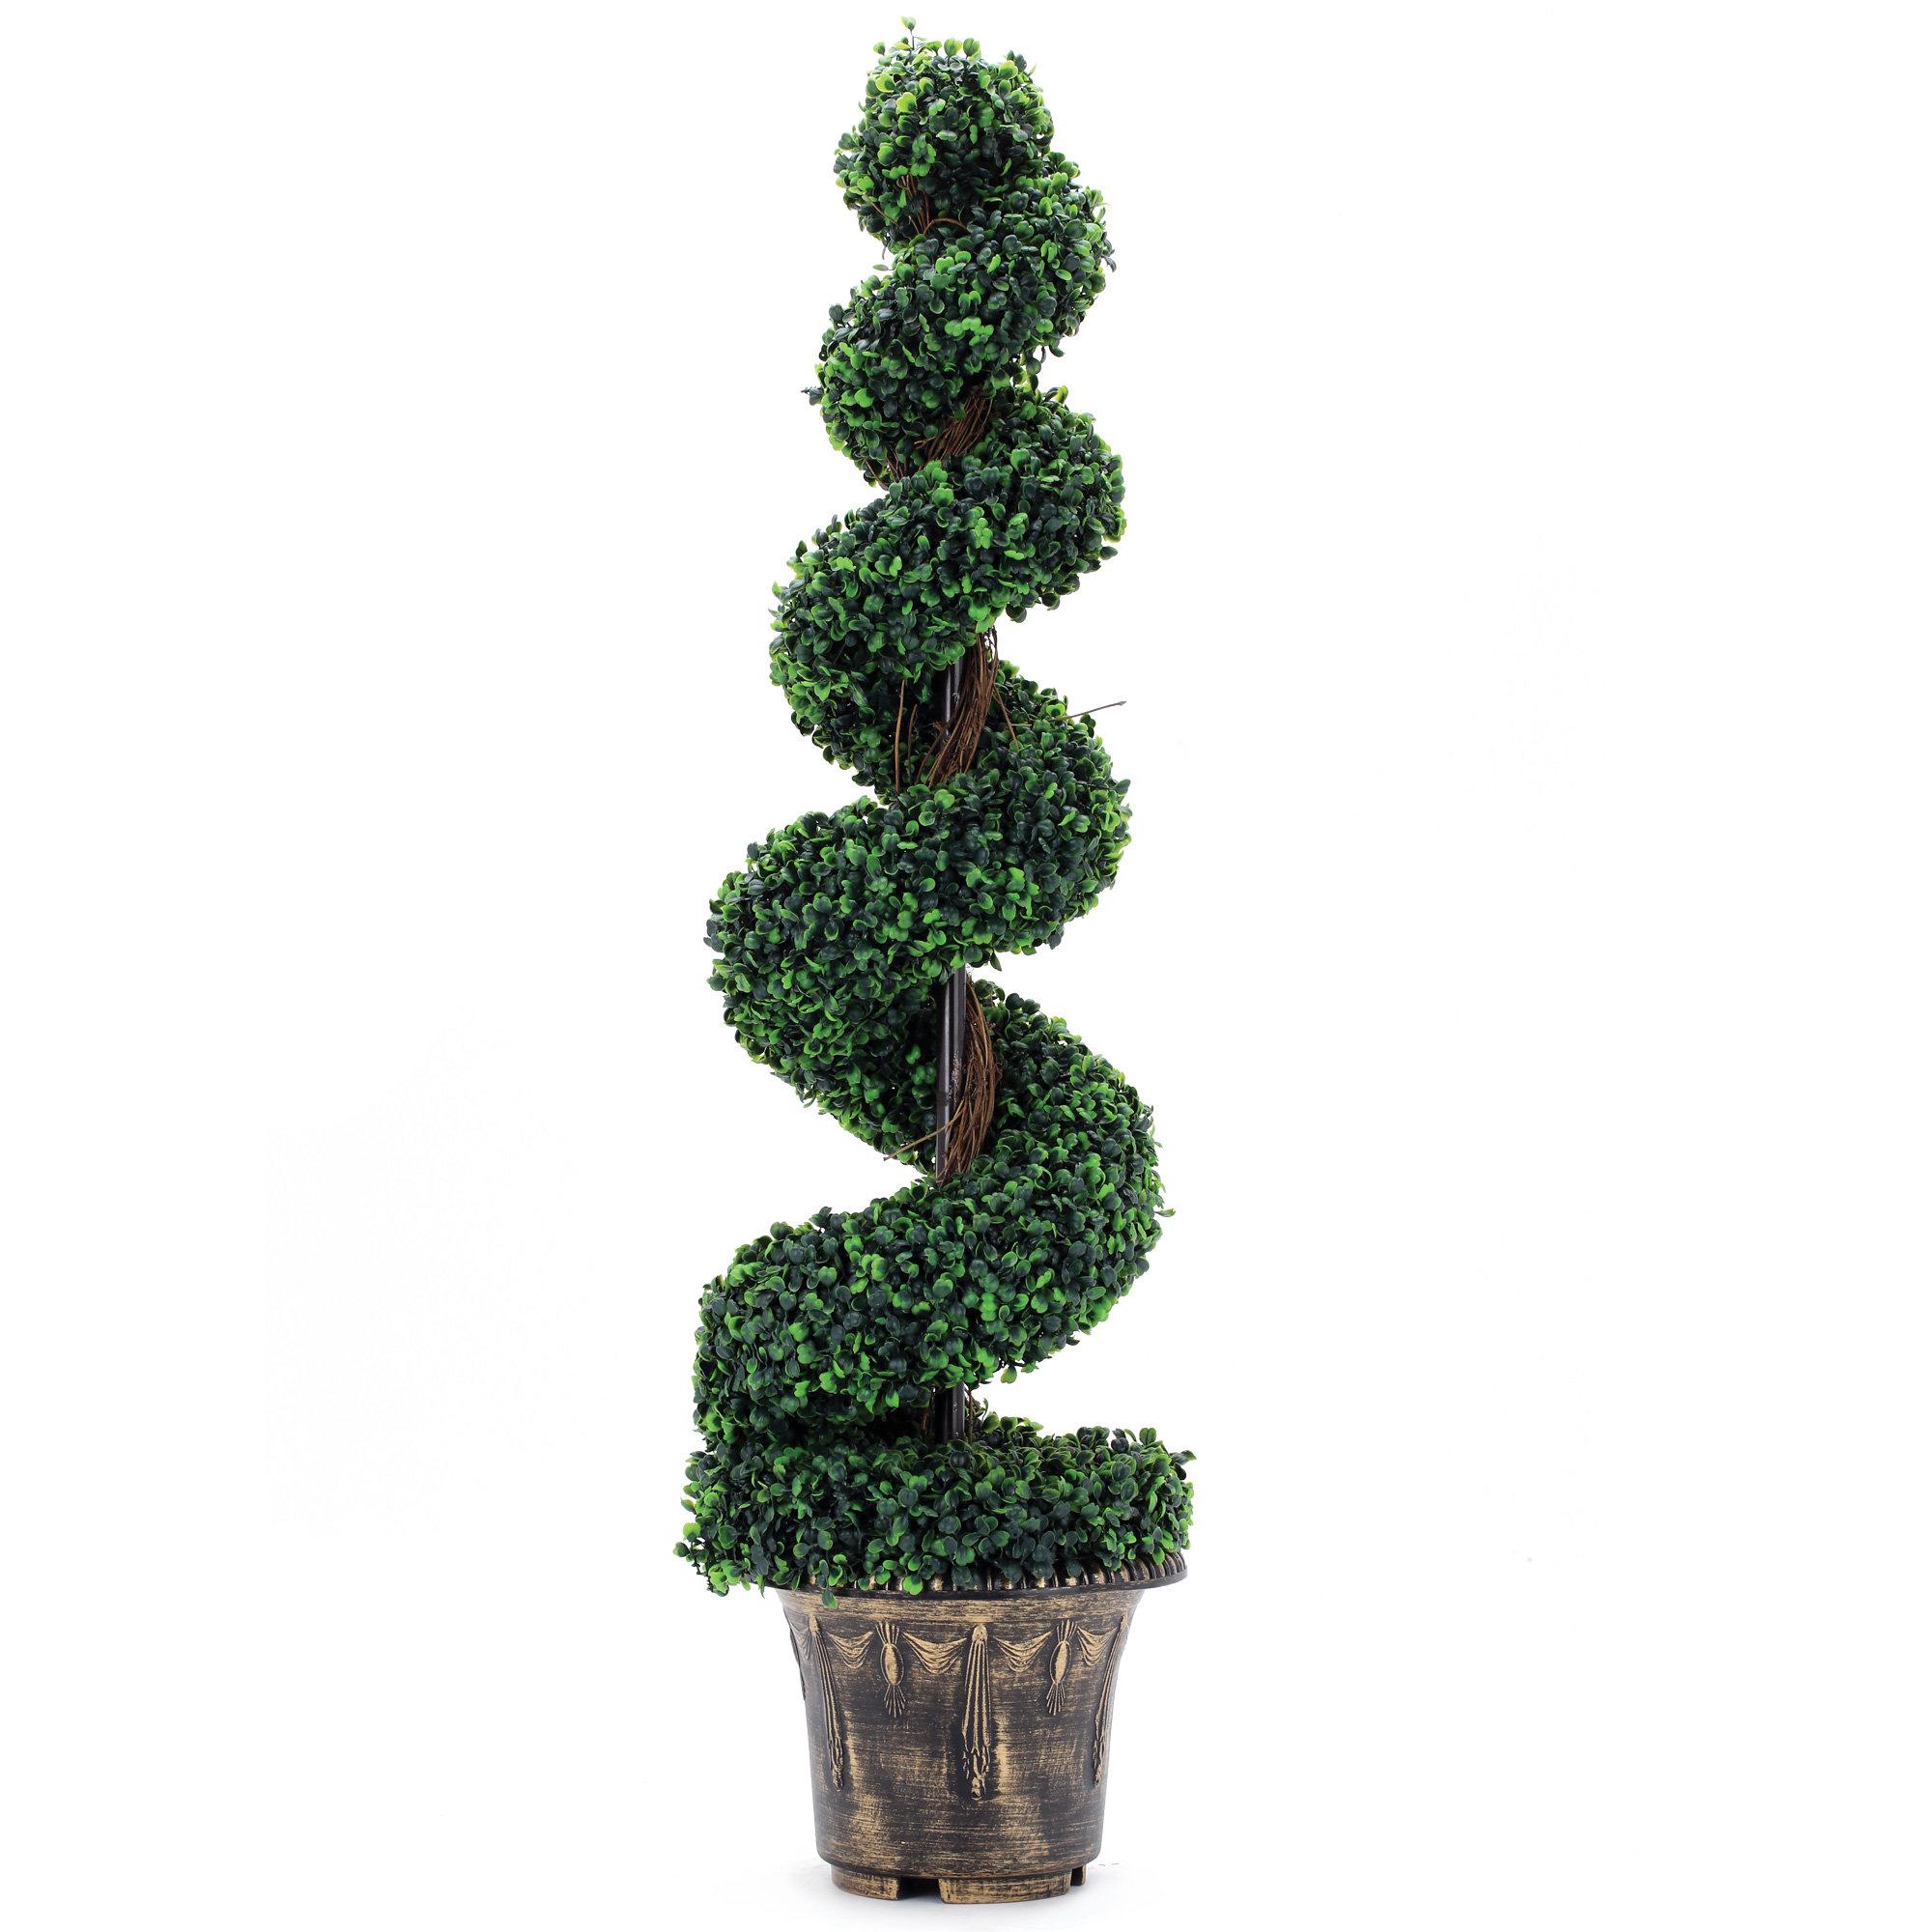 Fleur De Lis Living Artificial Tree Boxwood Topiary In Planter Wayfair